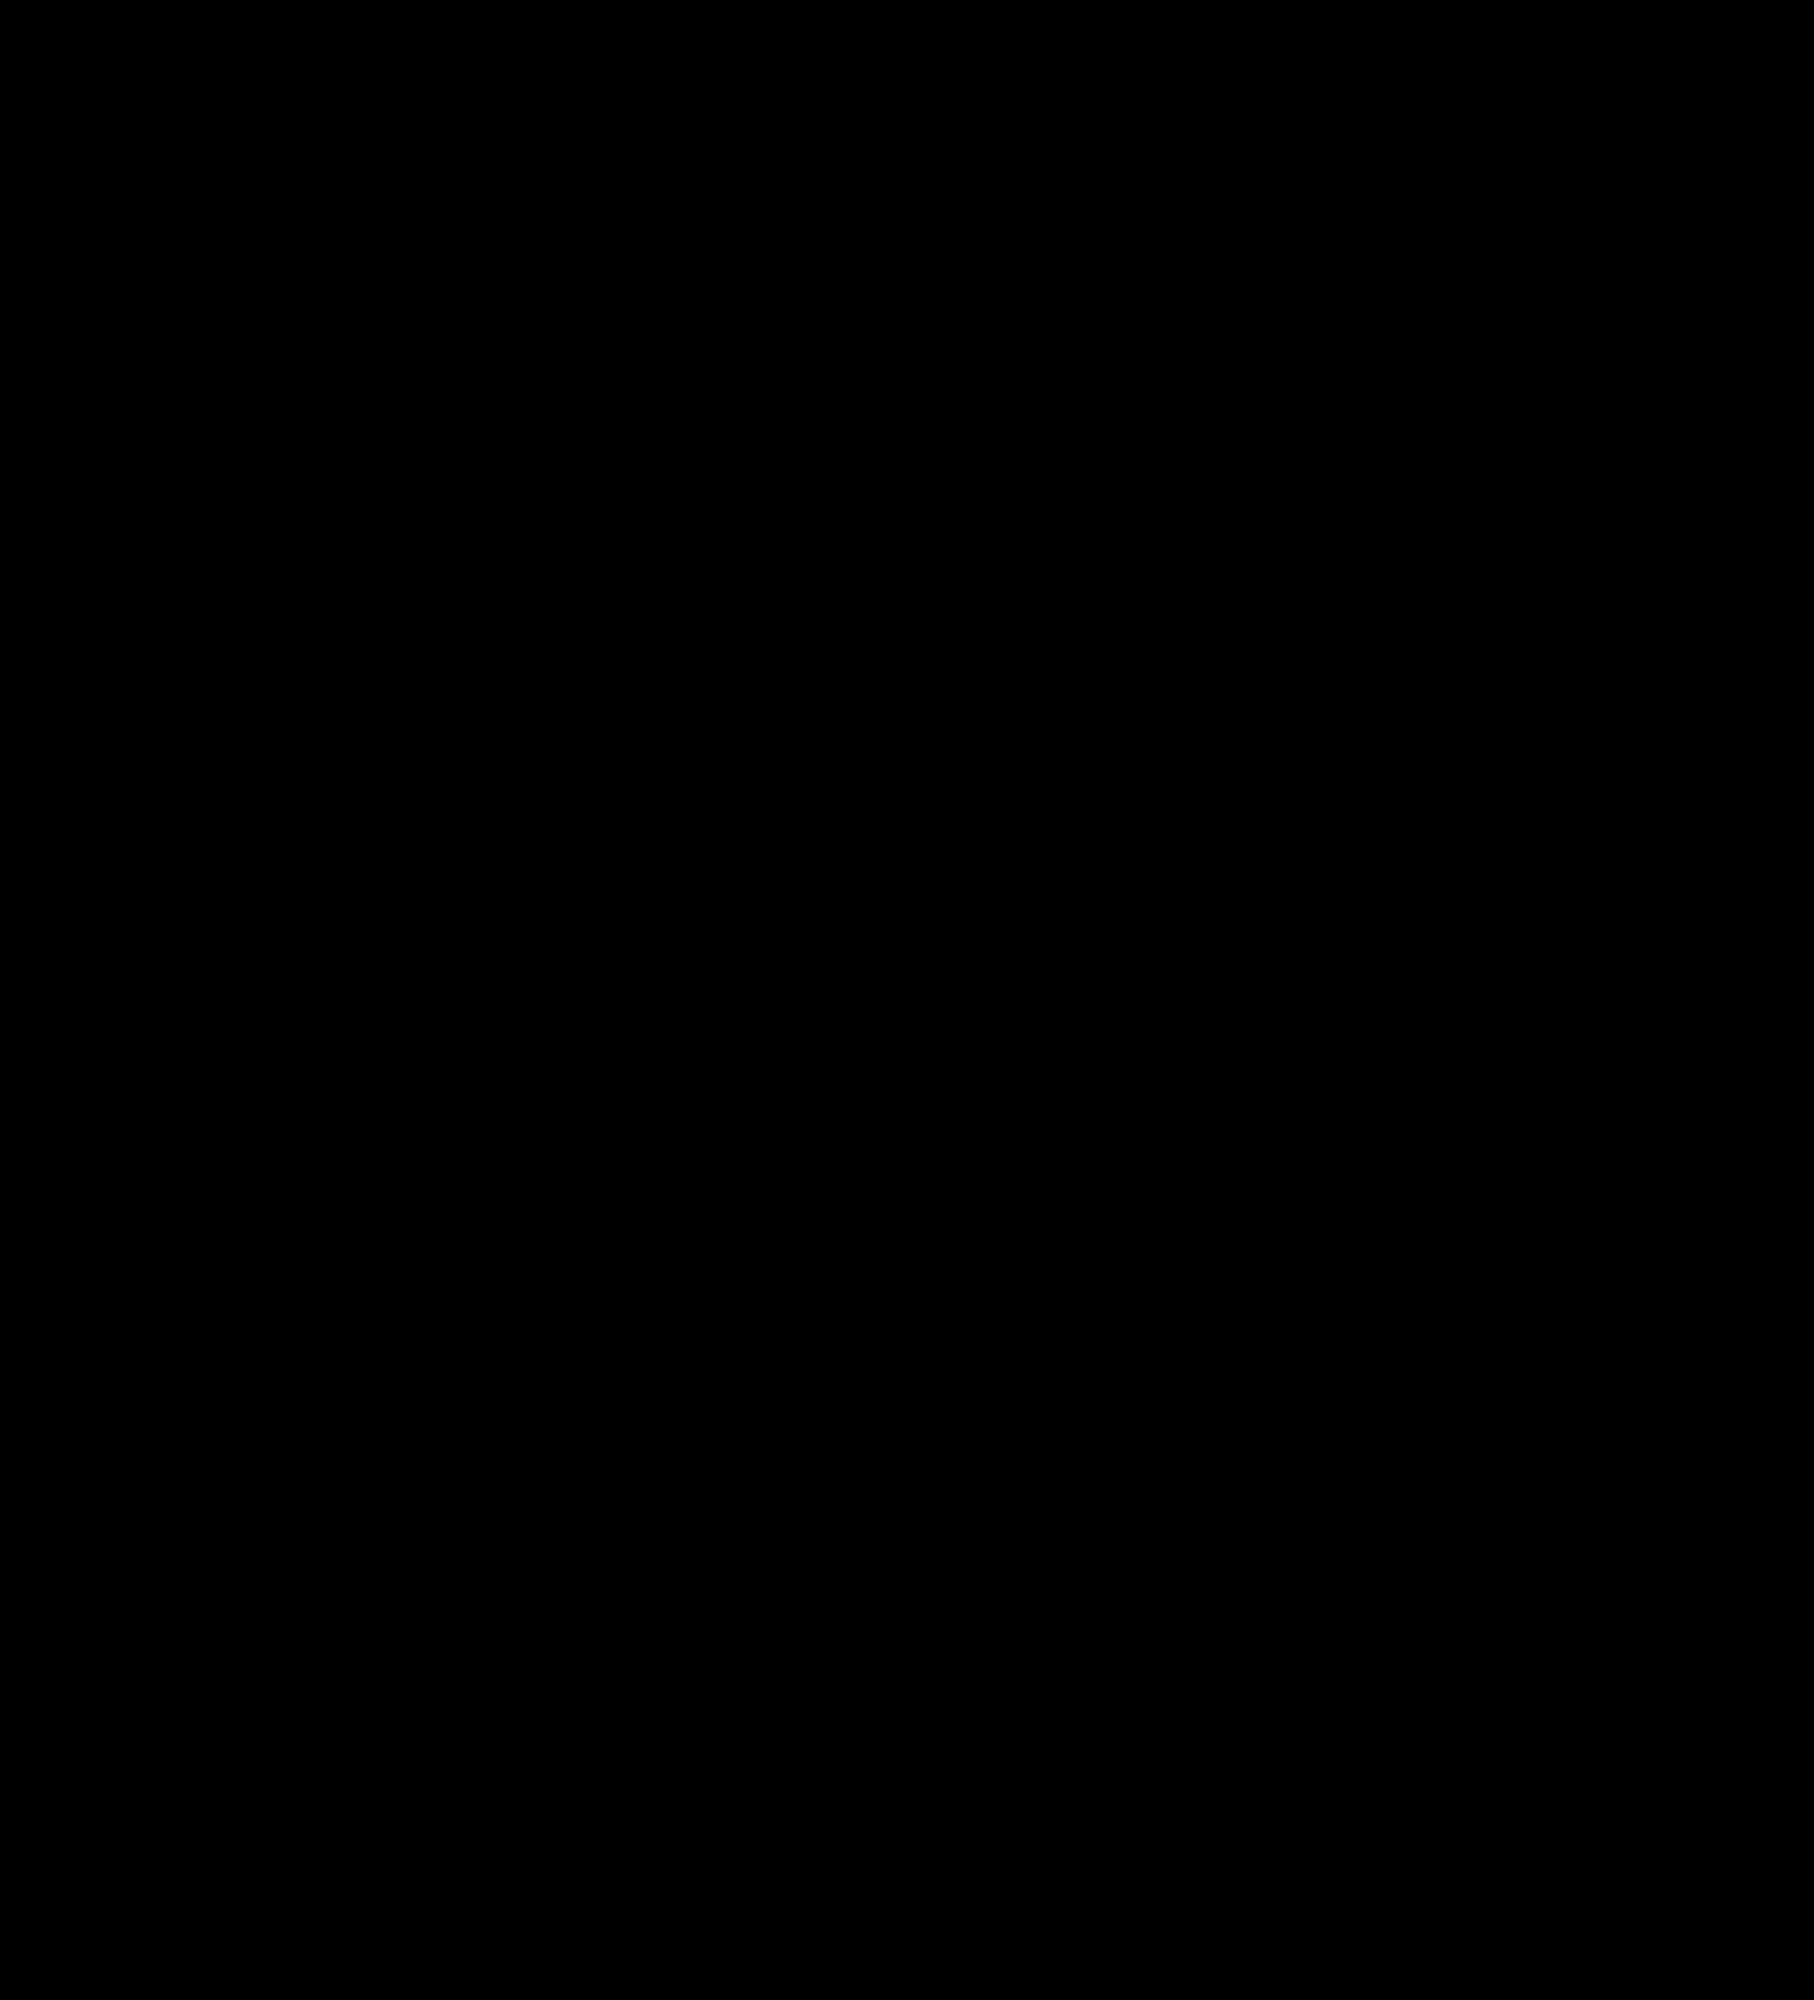 Aktivitetshus-logo-black.png